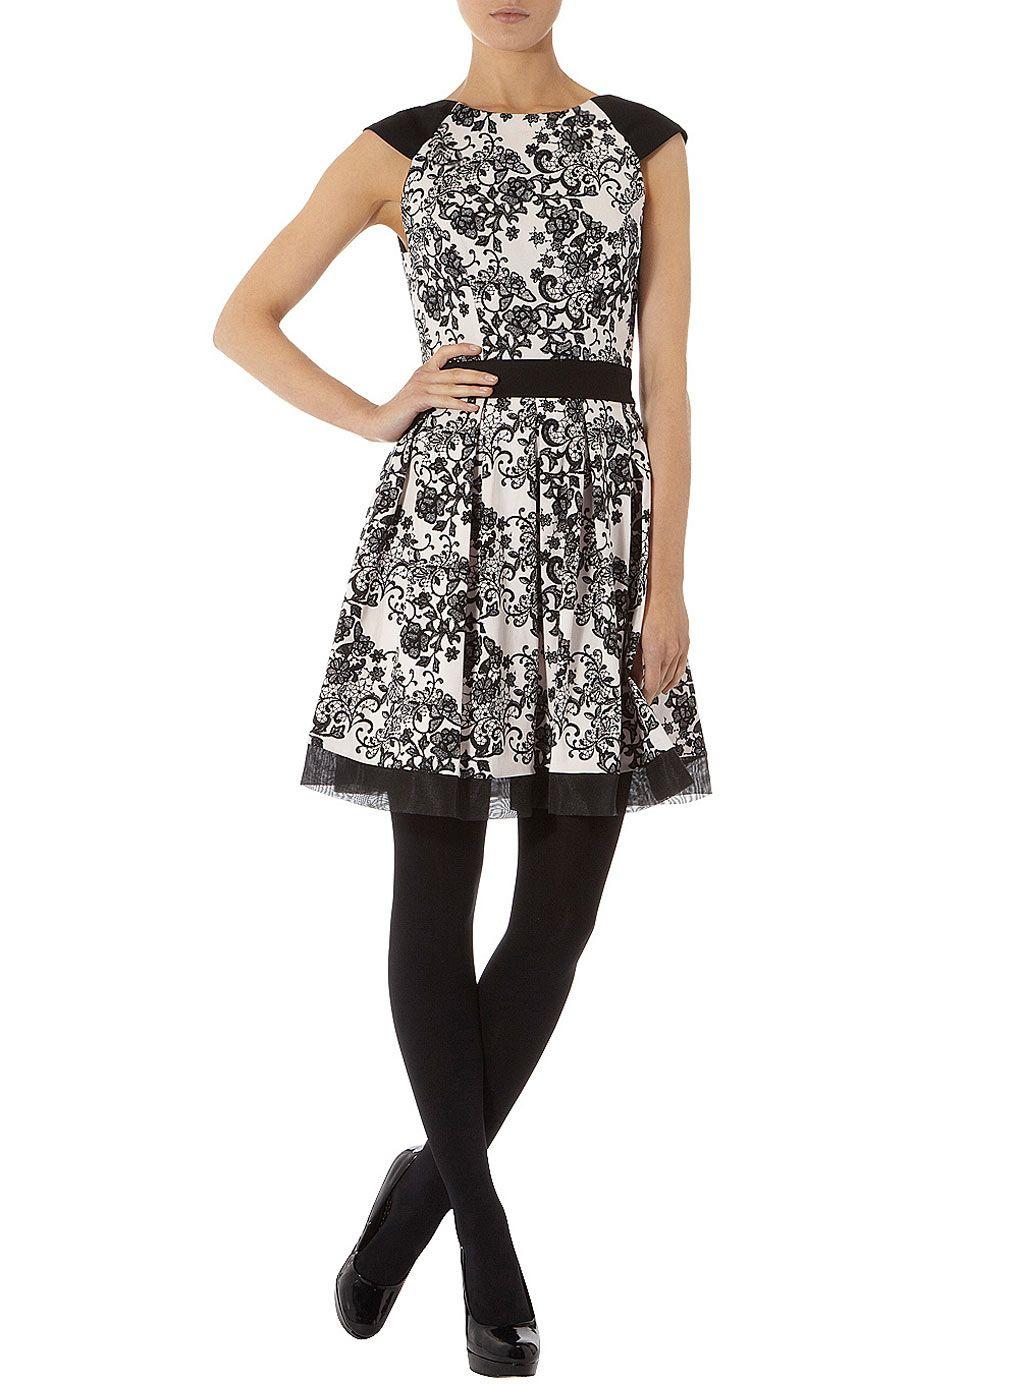 Lace organza trim prom dress my style pinterest prom